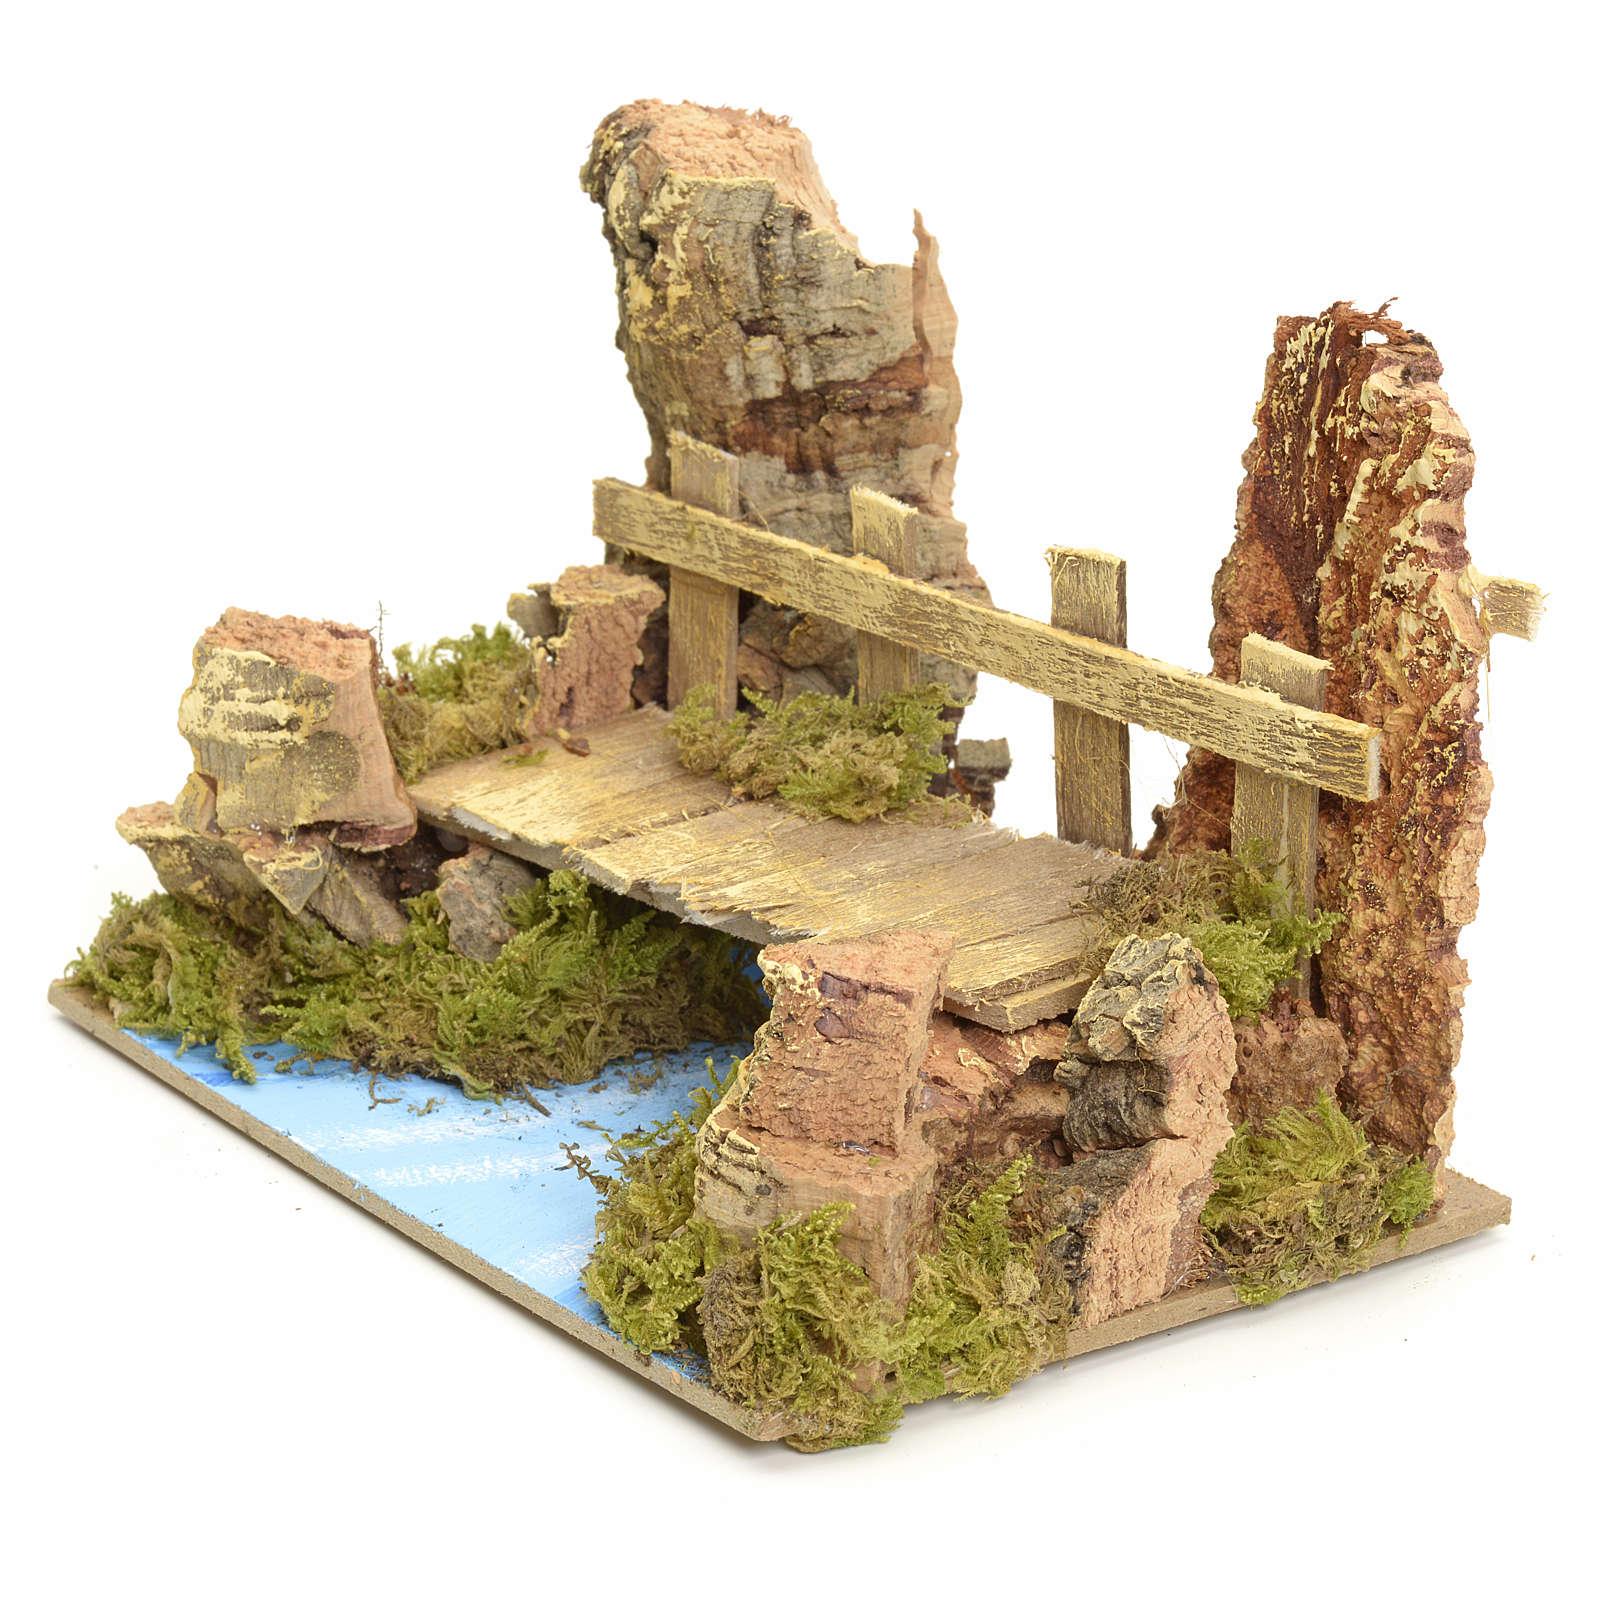 Ponte su fiume 10x15x10 cm per presepe 4